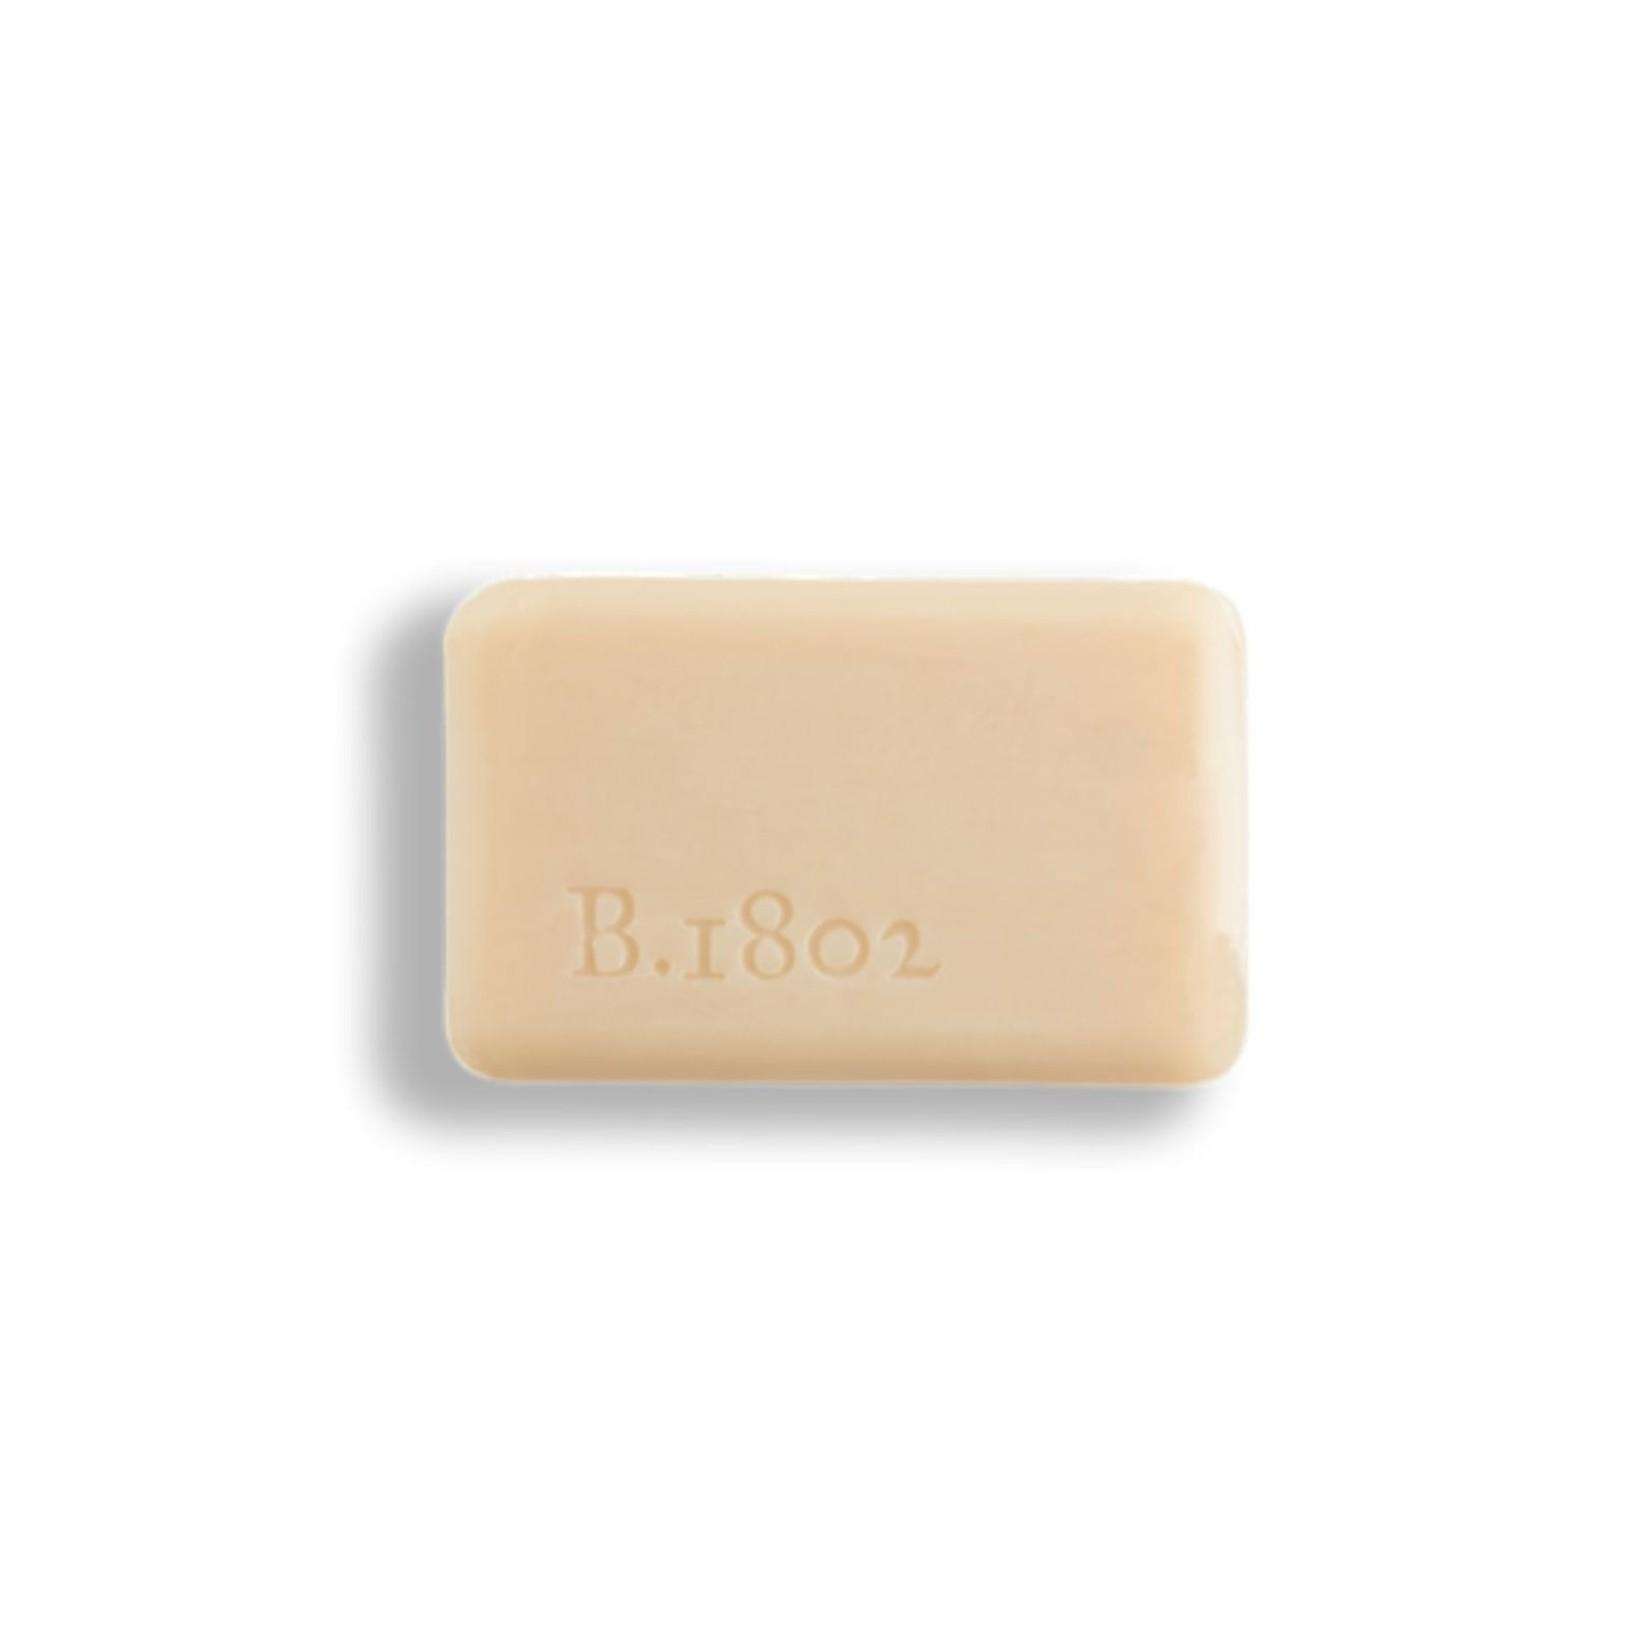 Oakmoss 9oz Bar Soap